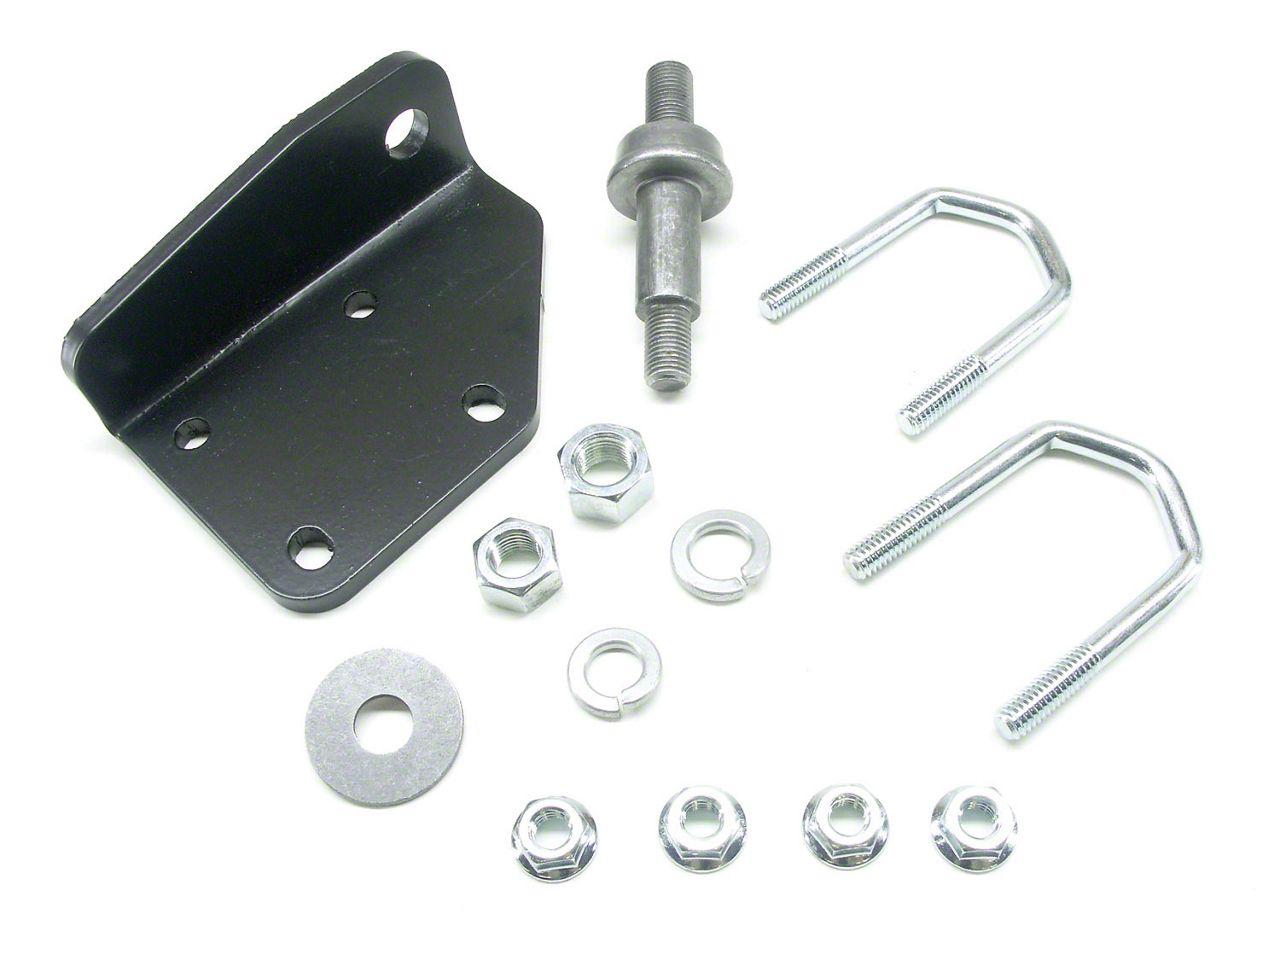 Teraflex Steering Stabilizer Mounting Bracket Kit (97-06 Jeep Wrangler TJ)